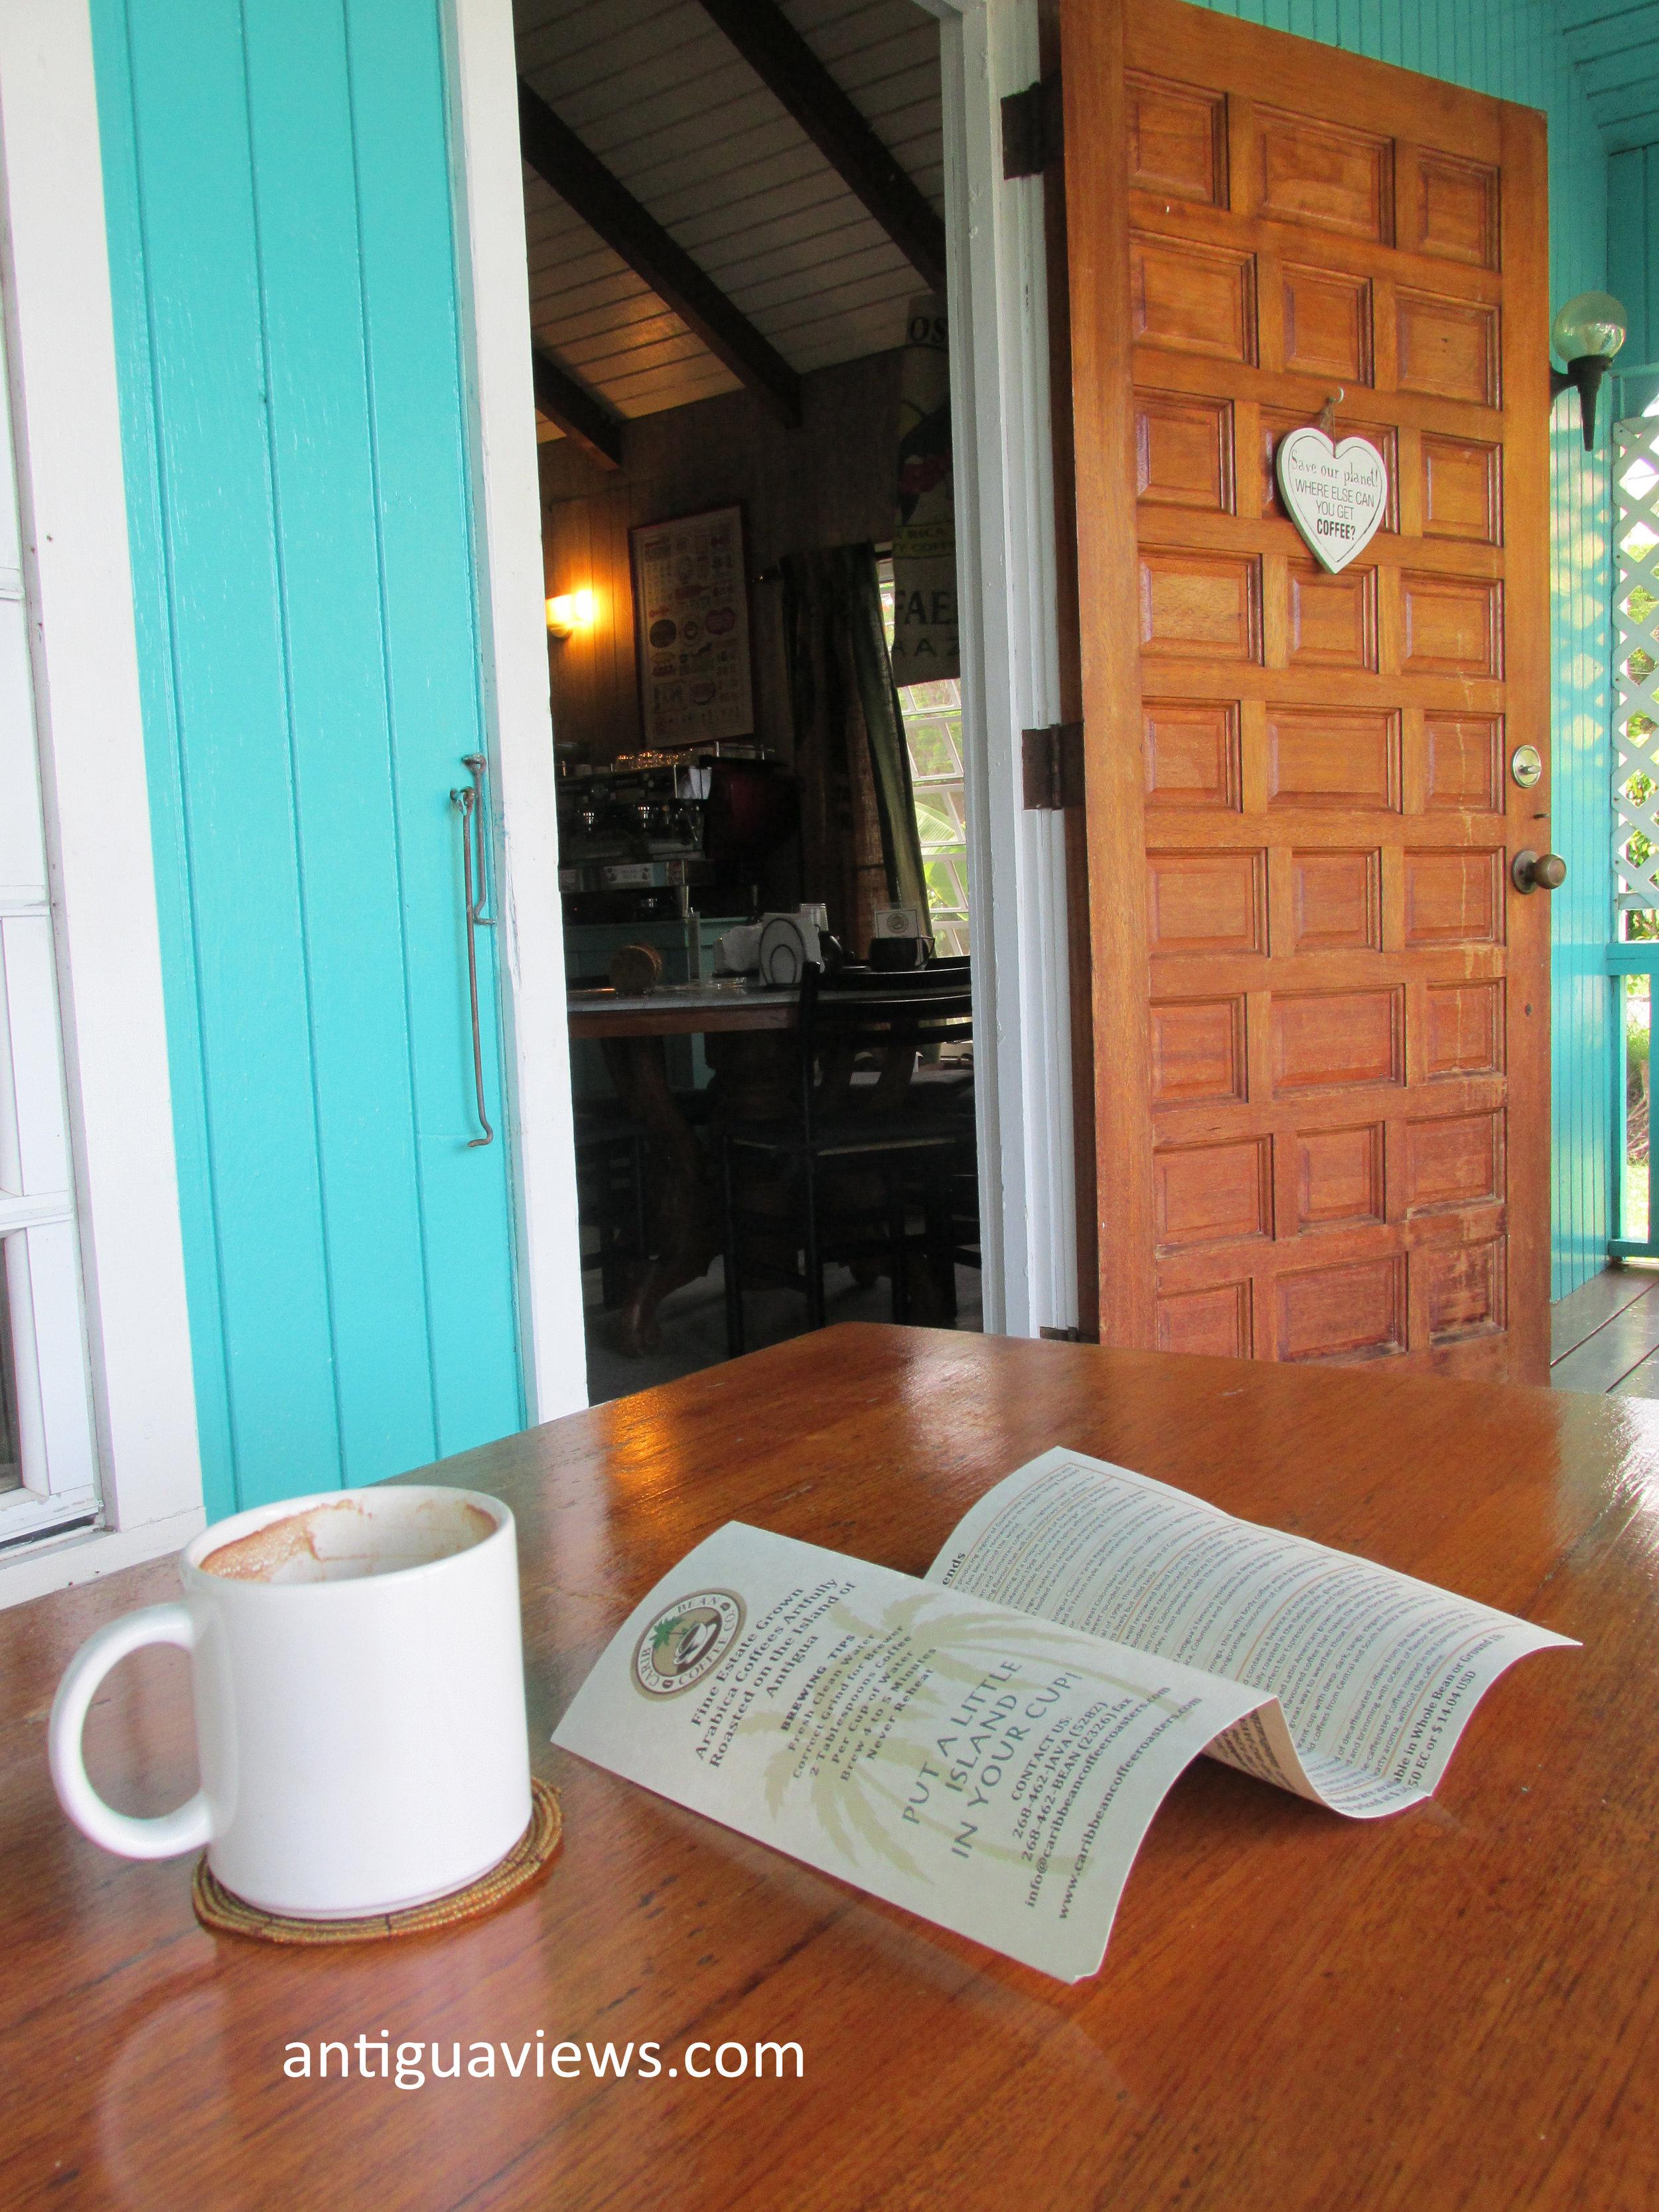 Enjoying a 'Hurricane Brew' at the Carib Bean coffee company in Antigua. Photo by Jennie Ritchie.